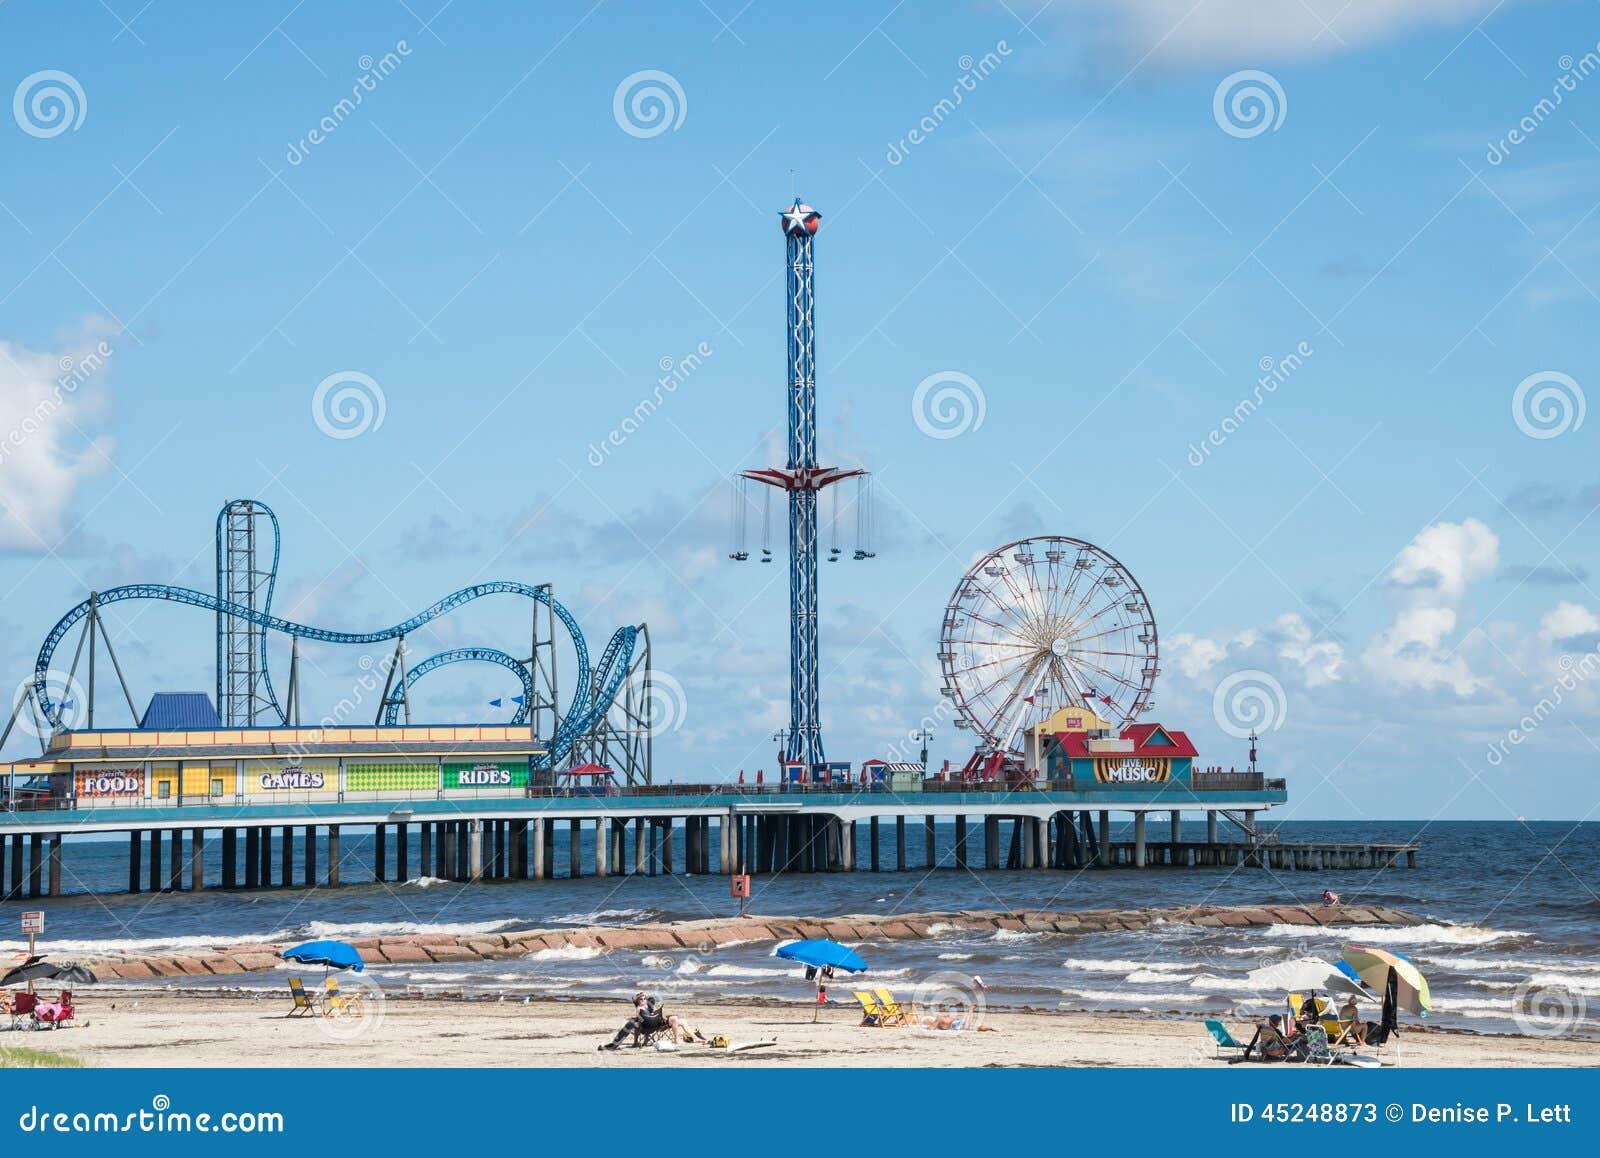 Galveston Pleasure Pier And Beach Editorial Stock Photo